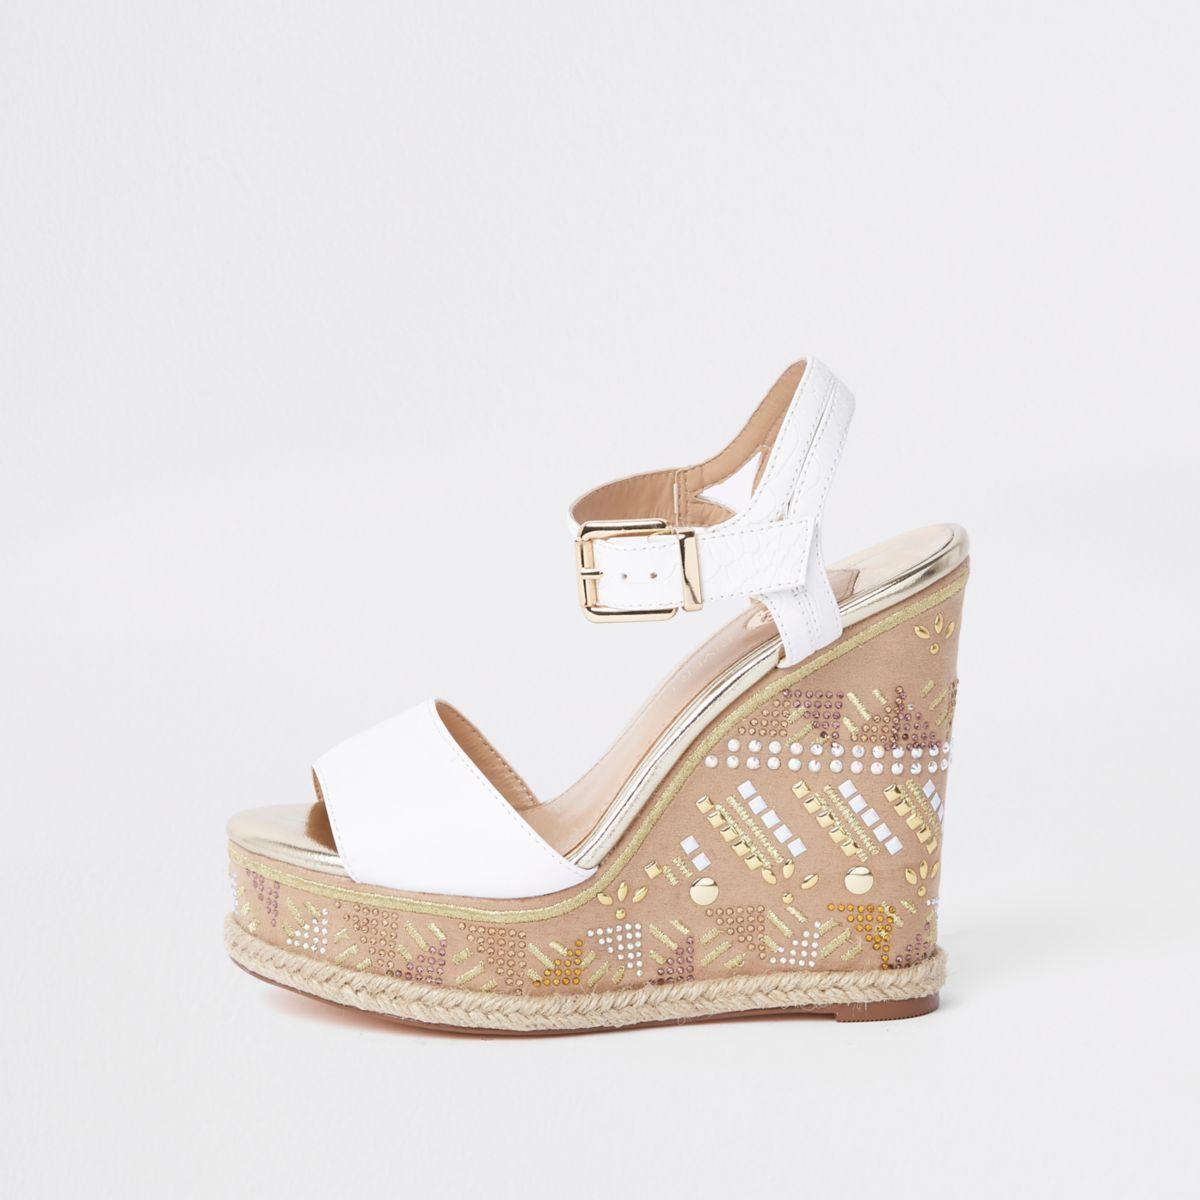 White embellished espadrille wedge sandals